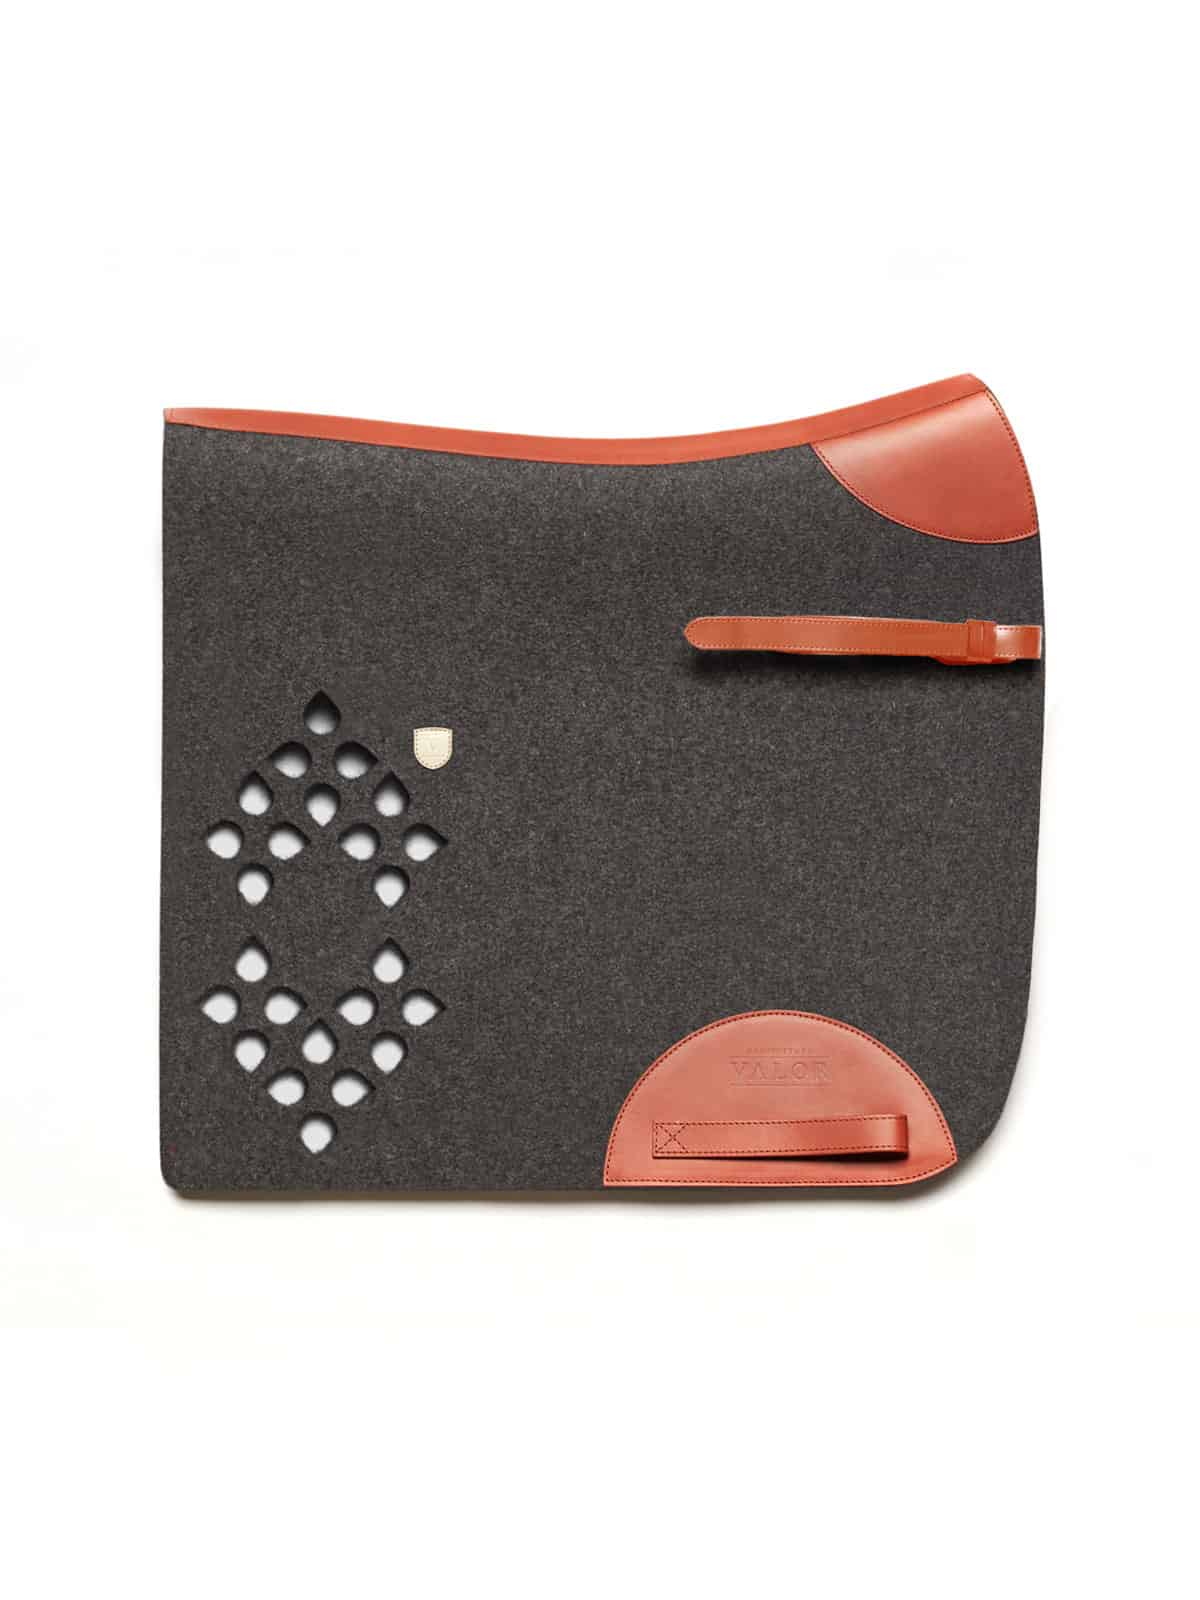 horseware saddle pad